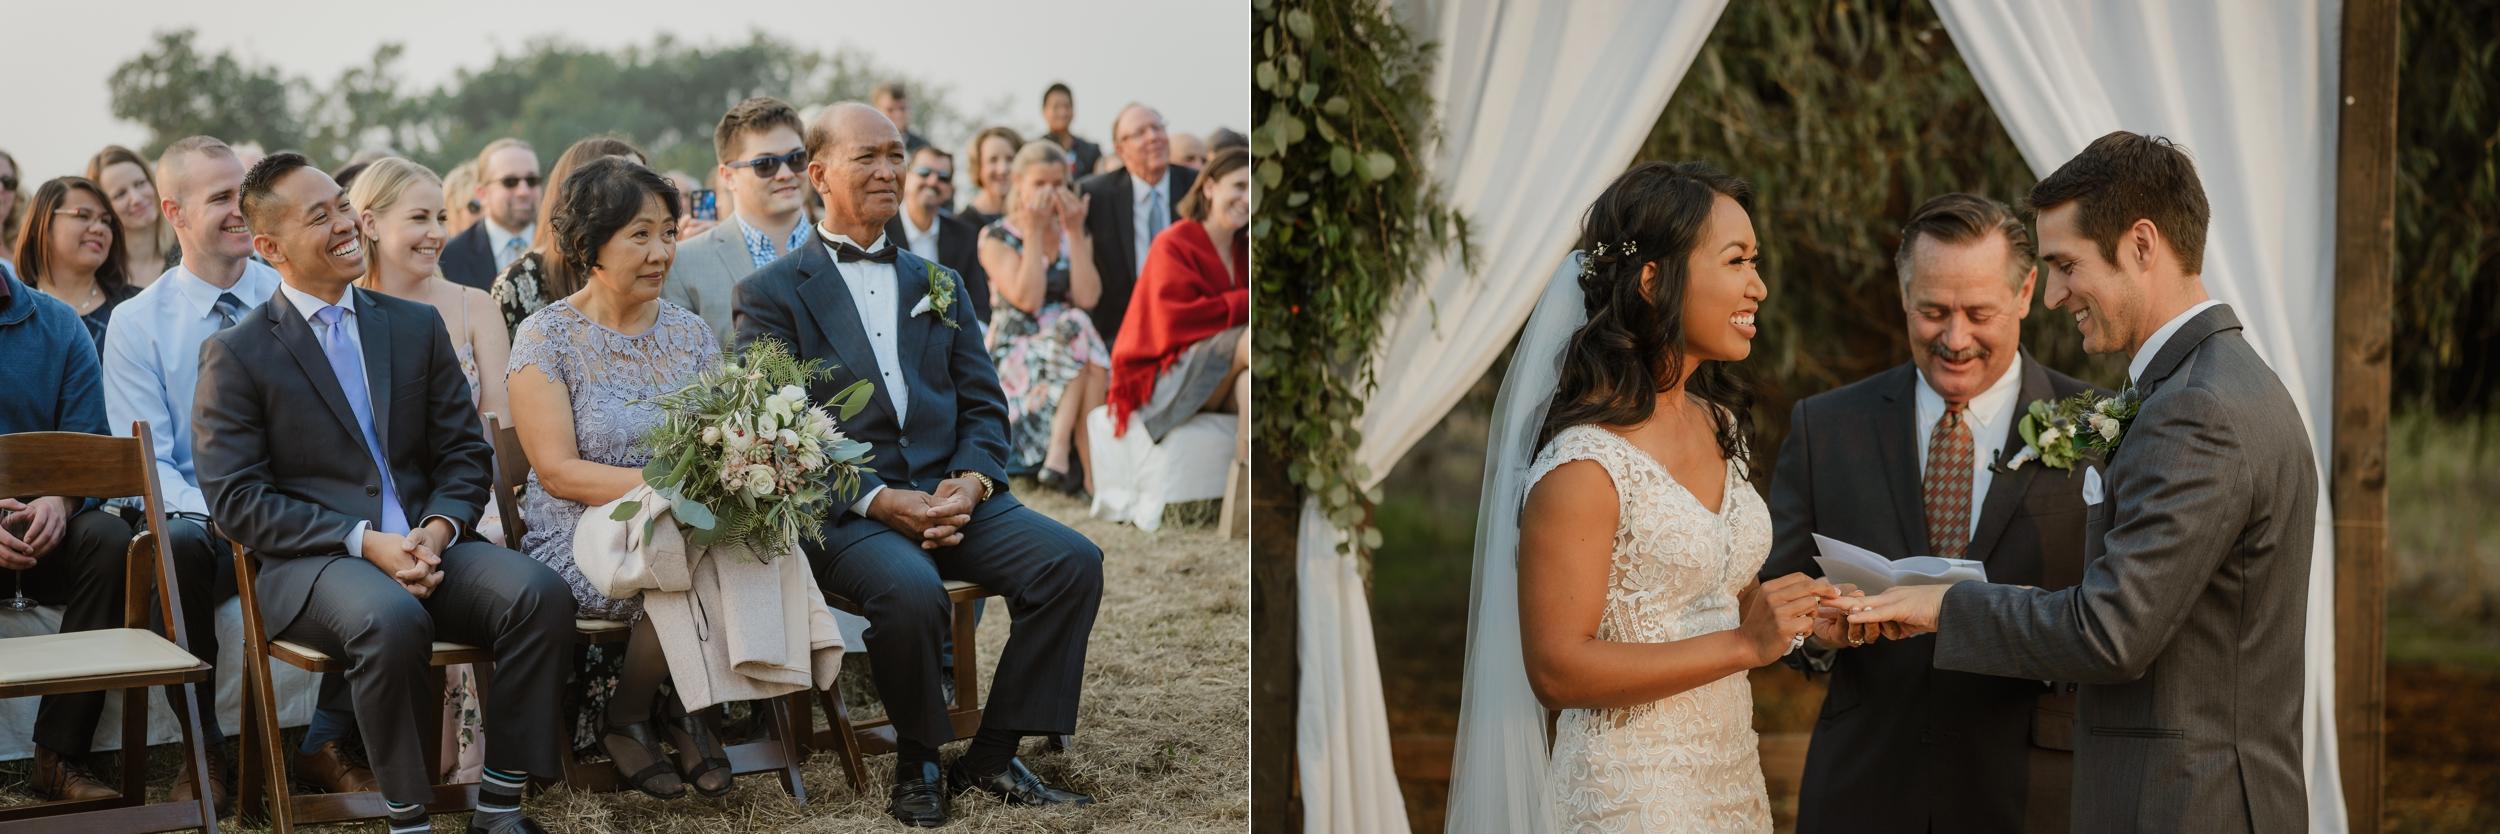 050marin-petaluma-backyard-wedding-vivianchen-308_WEB.jpg